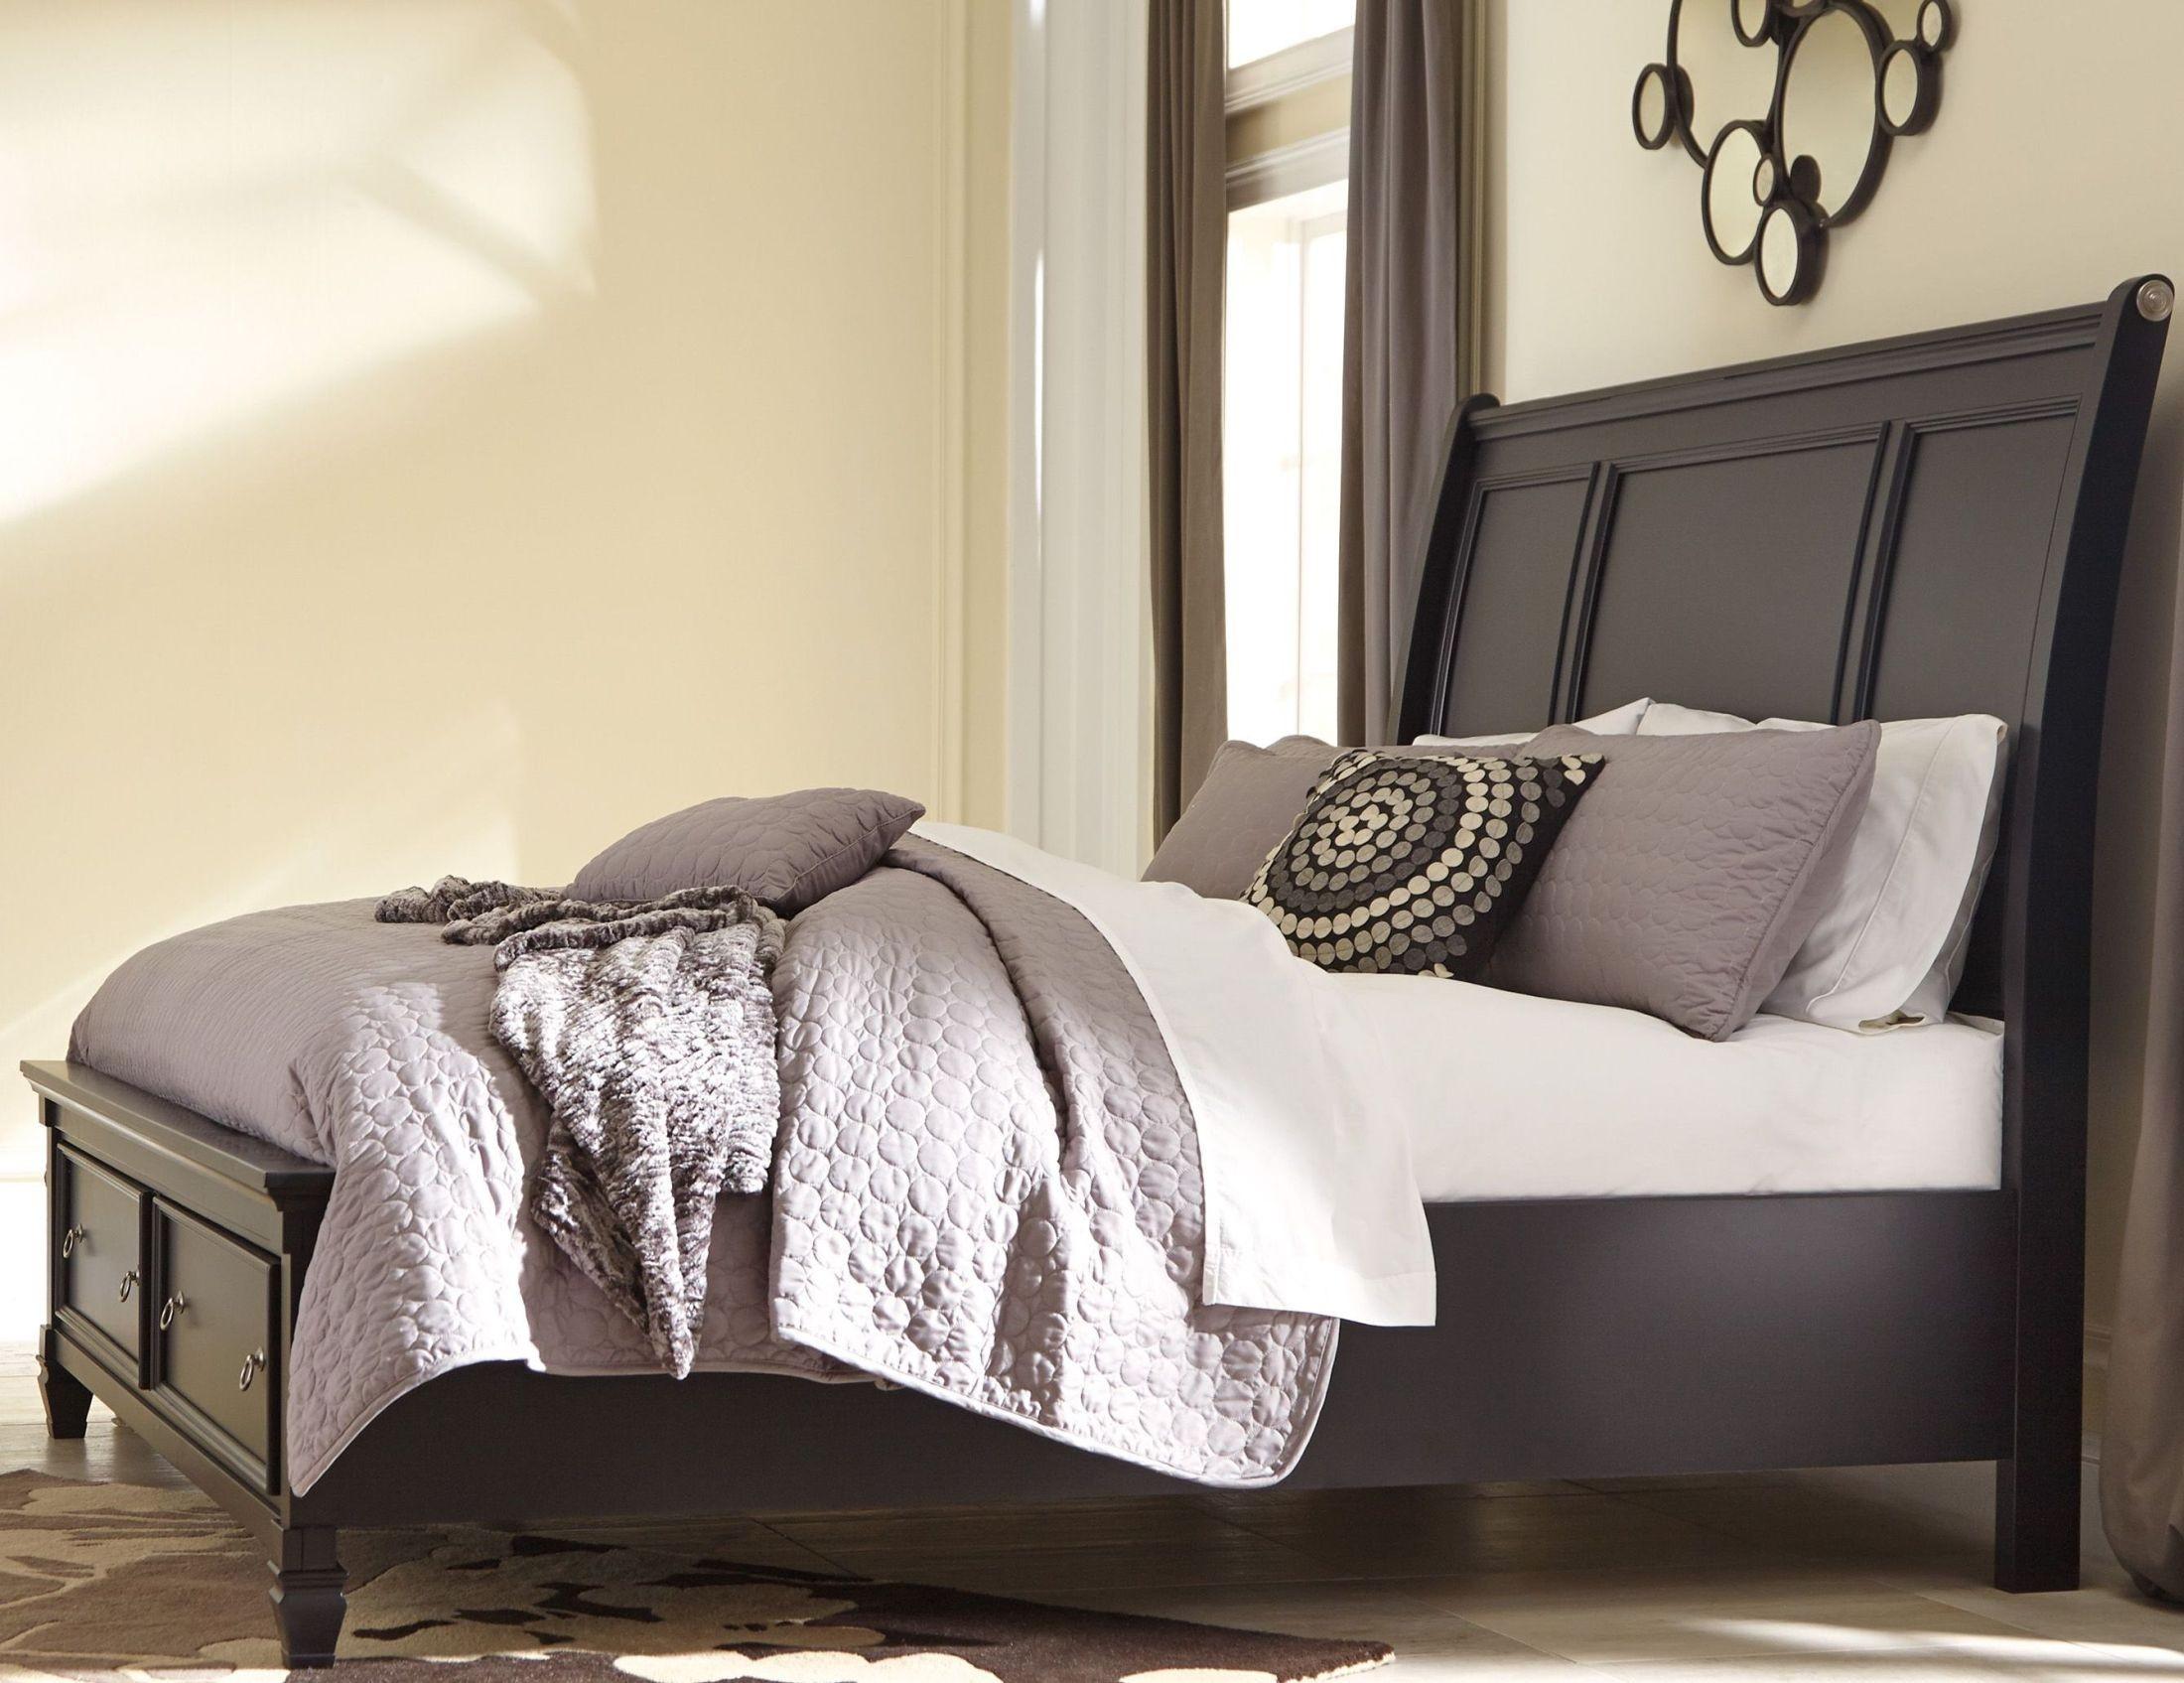 Greensburg Storage Sleigh Bedroom Set from Ashley (B671) | Coleman ...